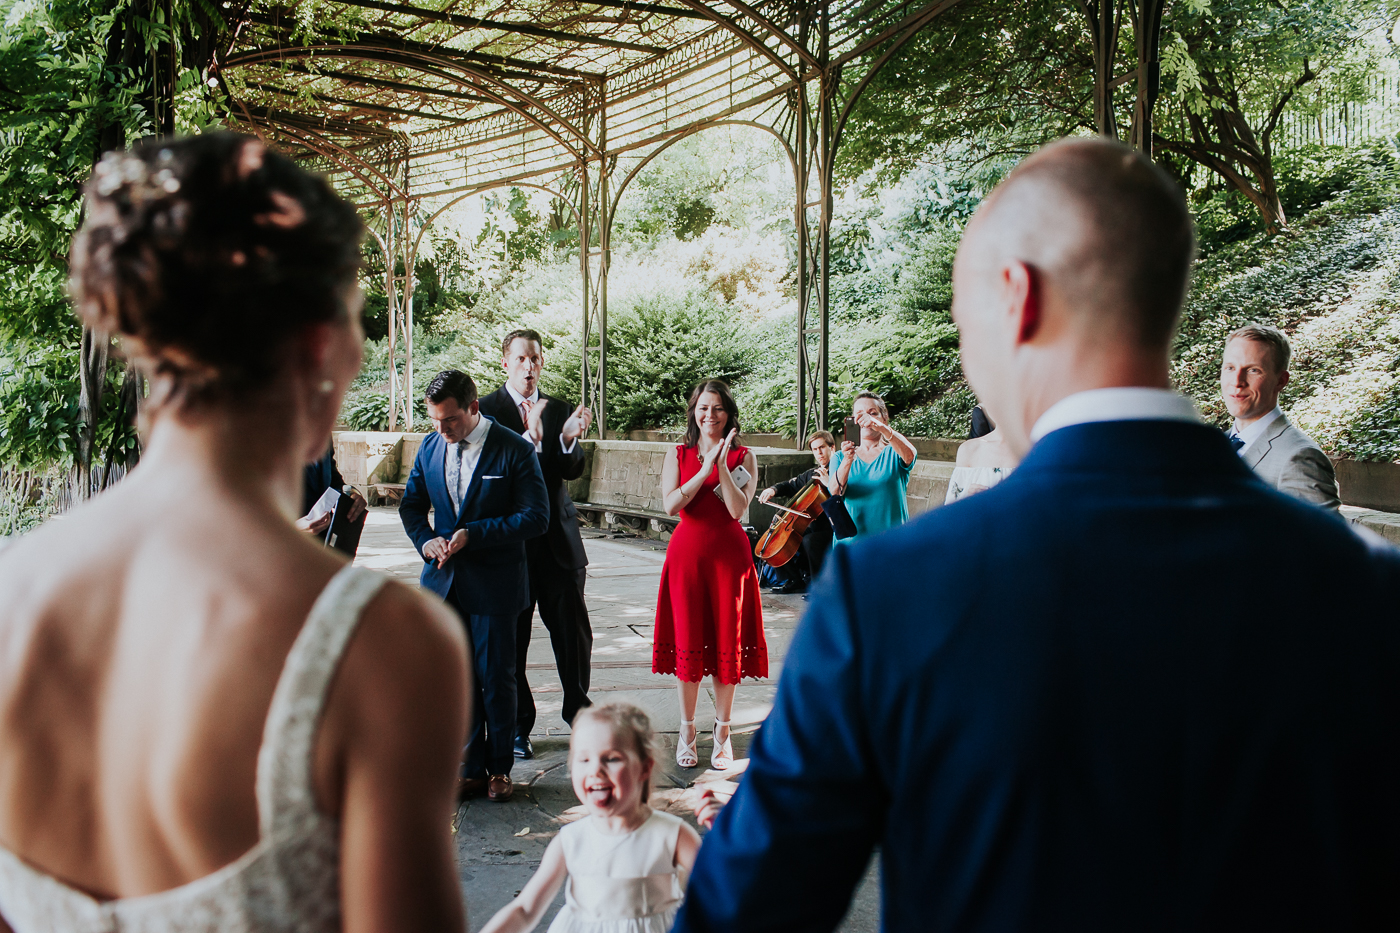 NYC-Central-Park-Conservatory-Garden-Intimate-Elopement-Documentary-Wedding-Photographer-31.jpg